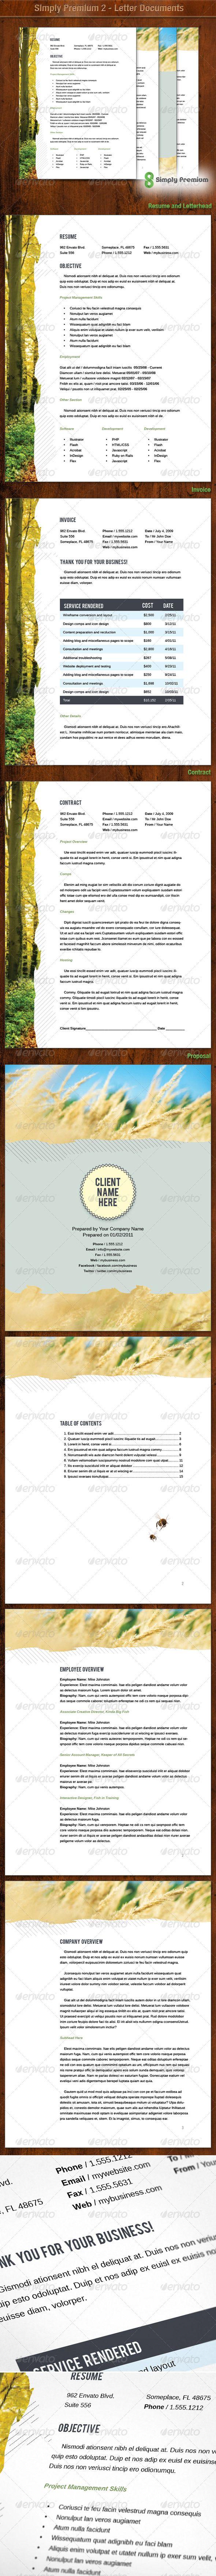 Simply Premium 2 Letterhead Resume Invoice Letterhead